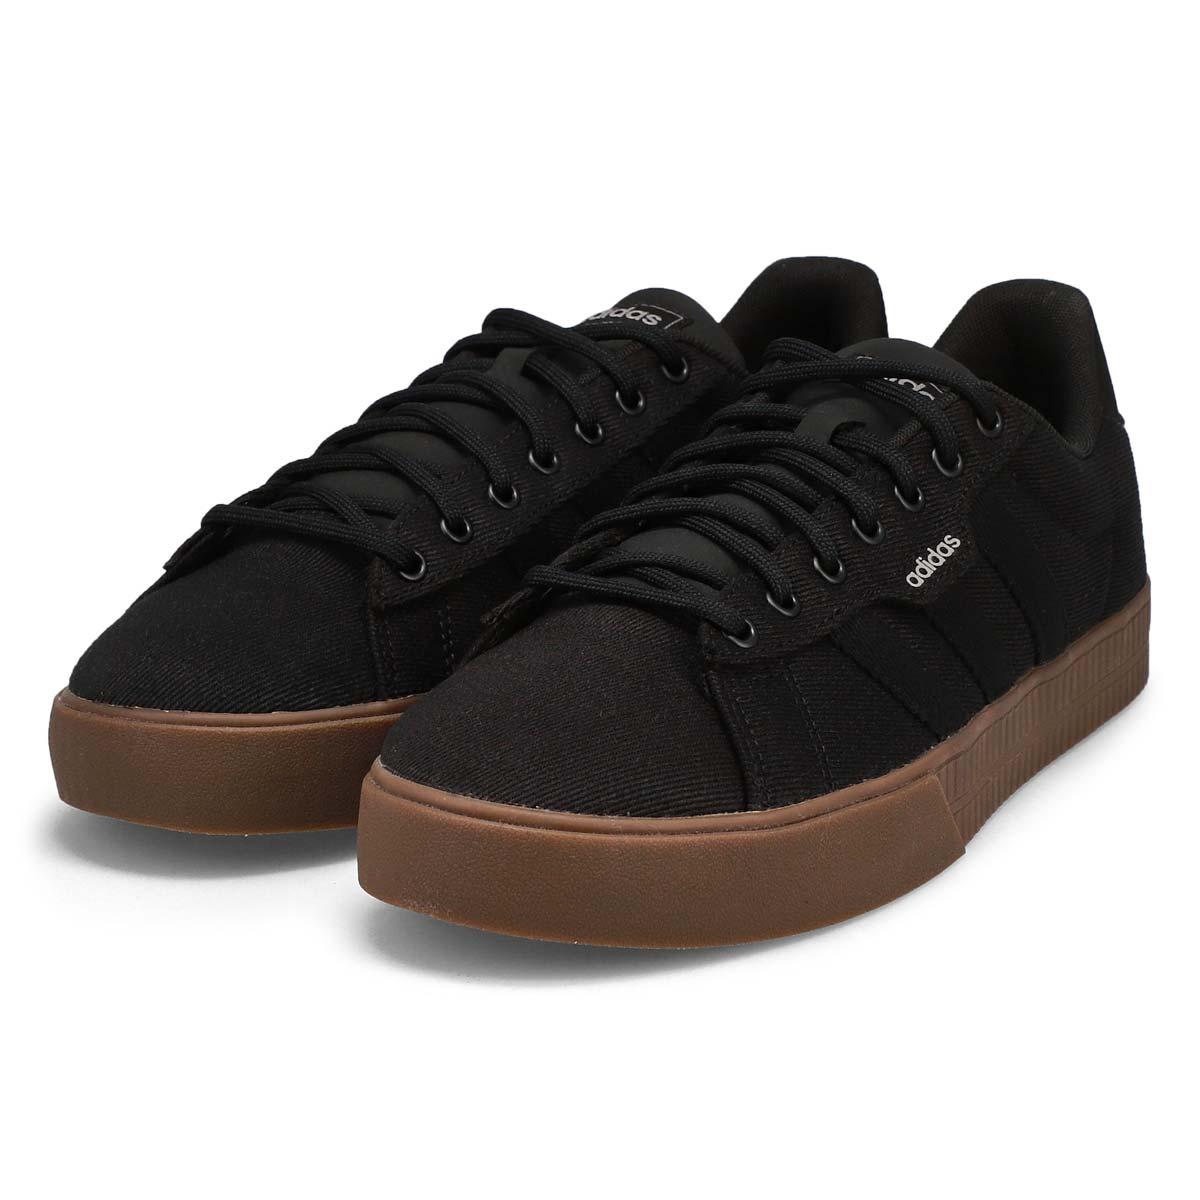 Men's Daily 3.0 Lace Up Sneaker - Black/Gum